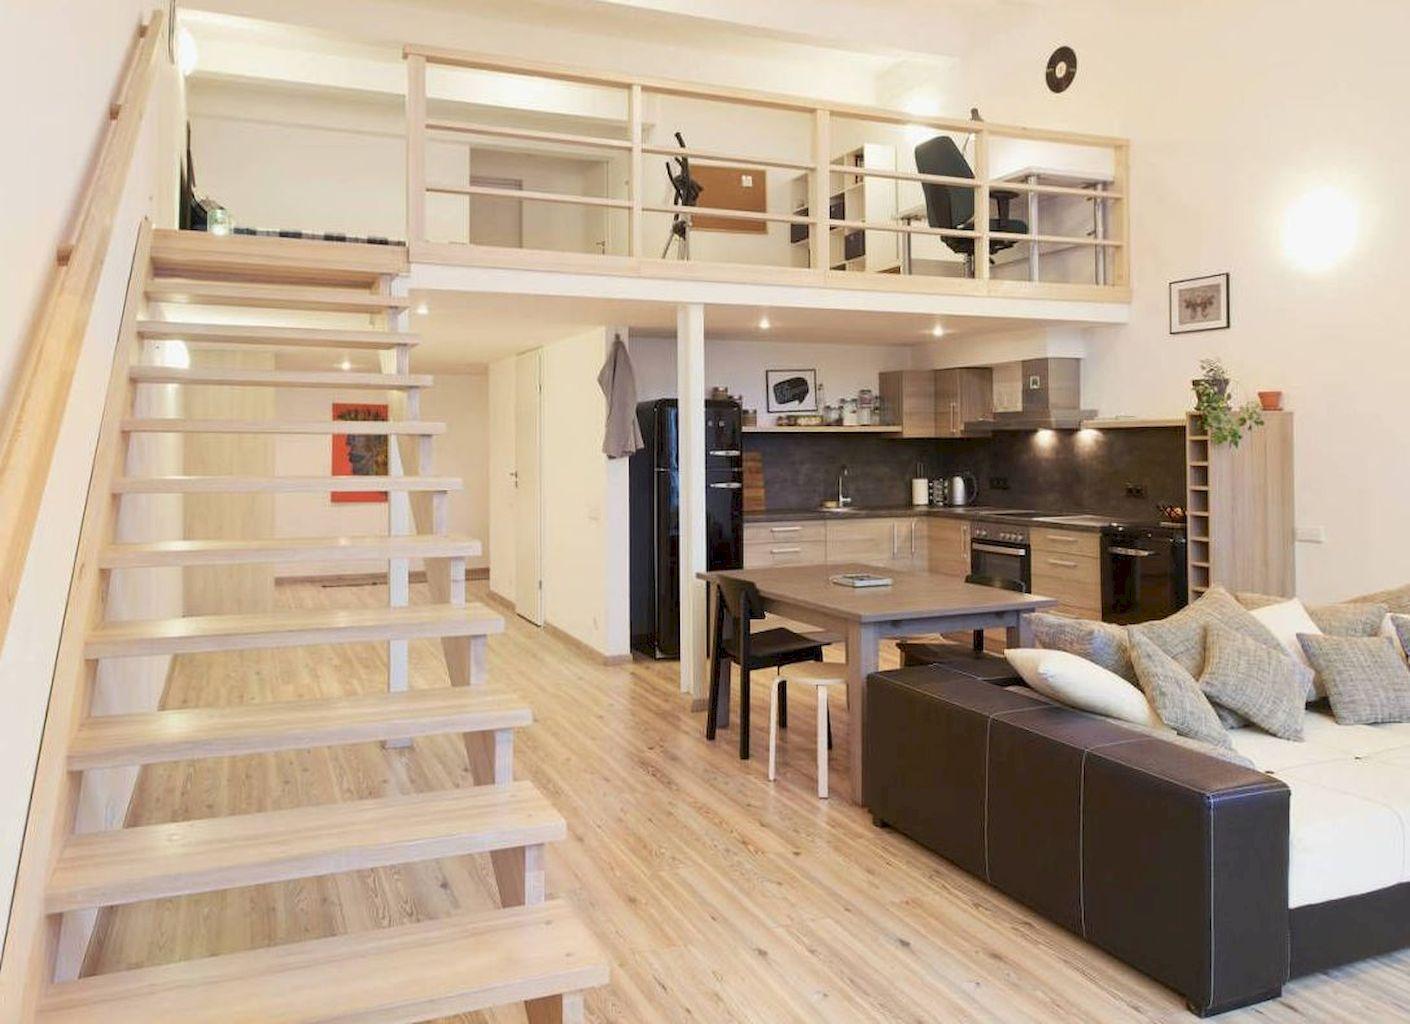 65 DIY College Apartment Decorating Ideas Small loft